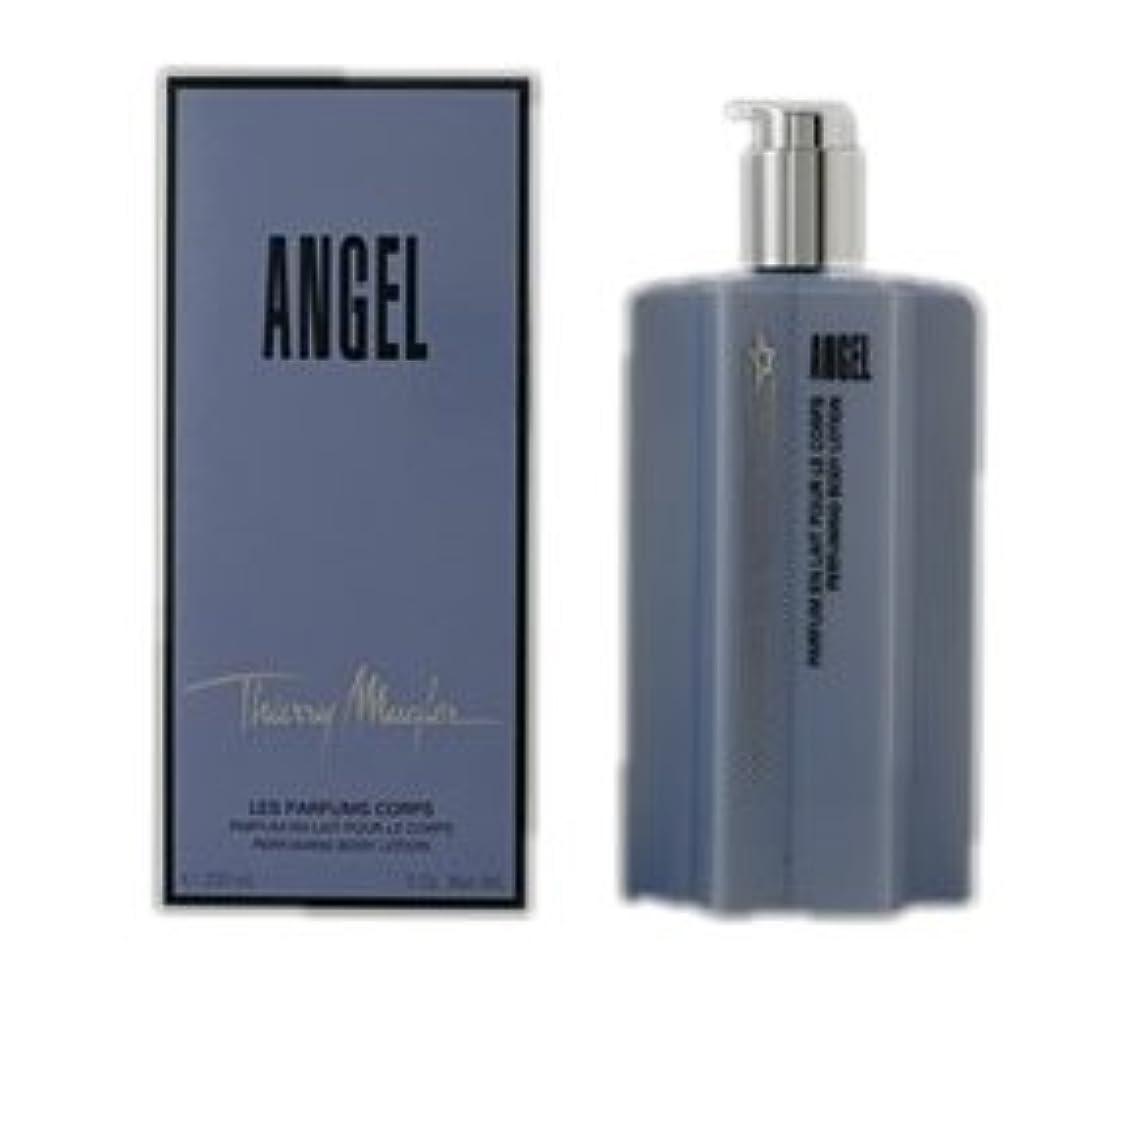 Thierry Mugler Angel Perfuming Body Lotion 200ml [並行輸入品]